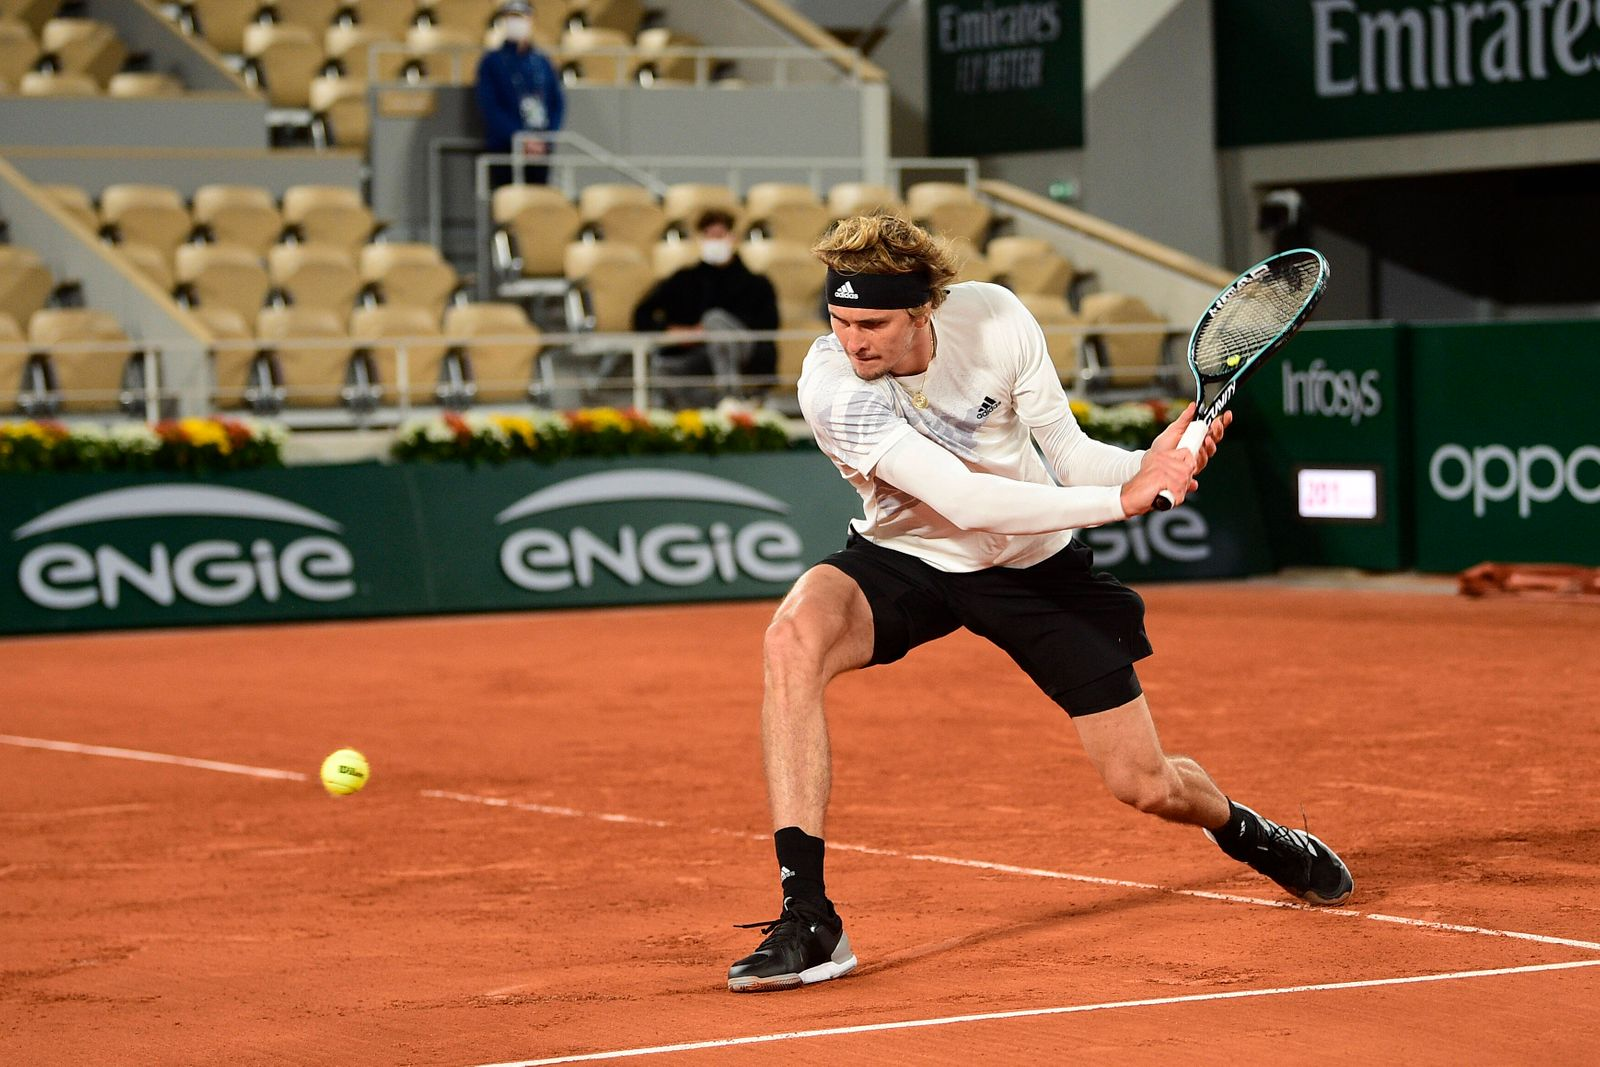 Alexander Zverev (Ger) TENNIS : Internationaux de France Roland Garros 2020 - Paris - 27/09/2020 JBAutissier/Panoramic